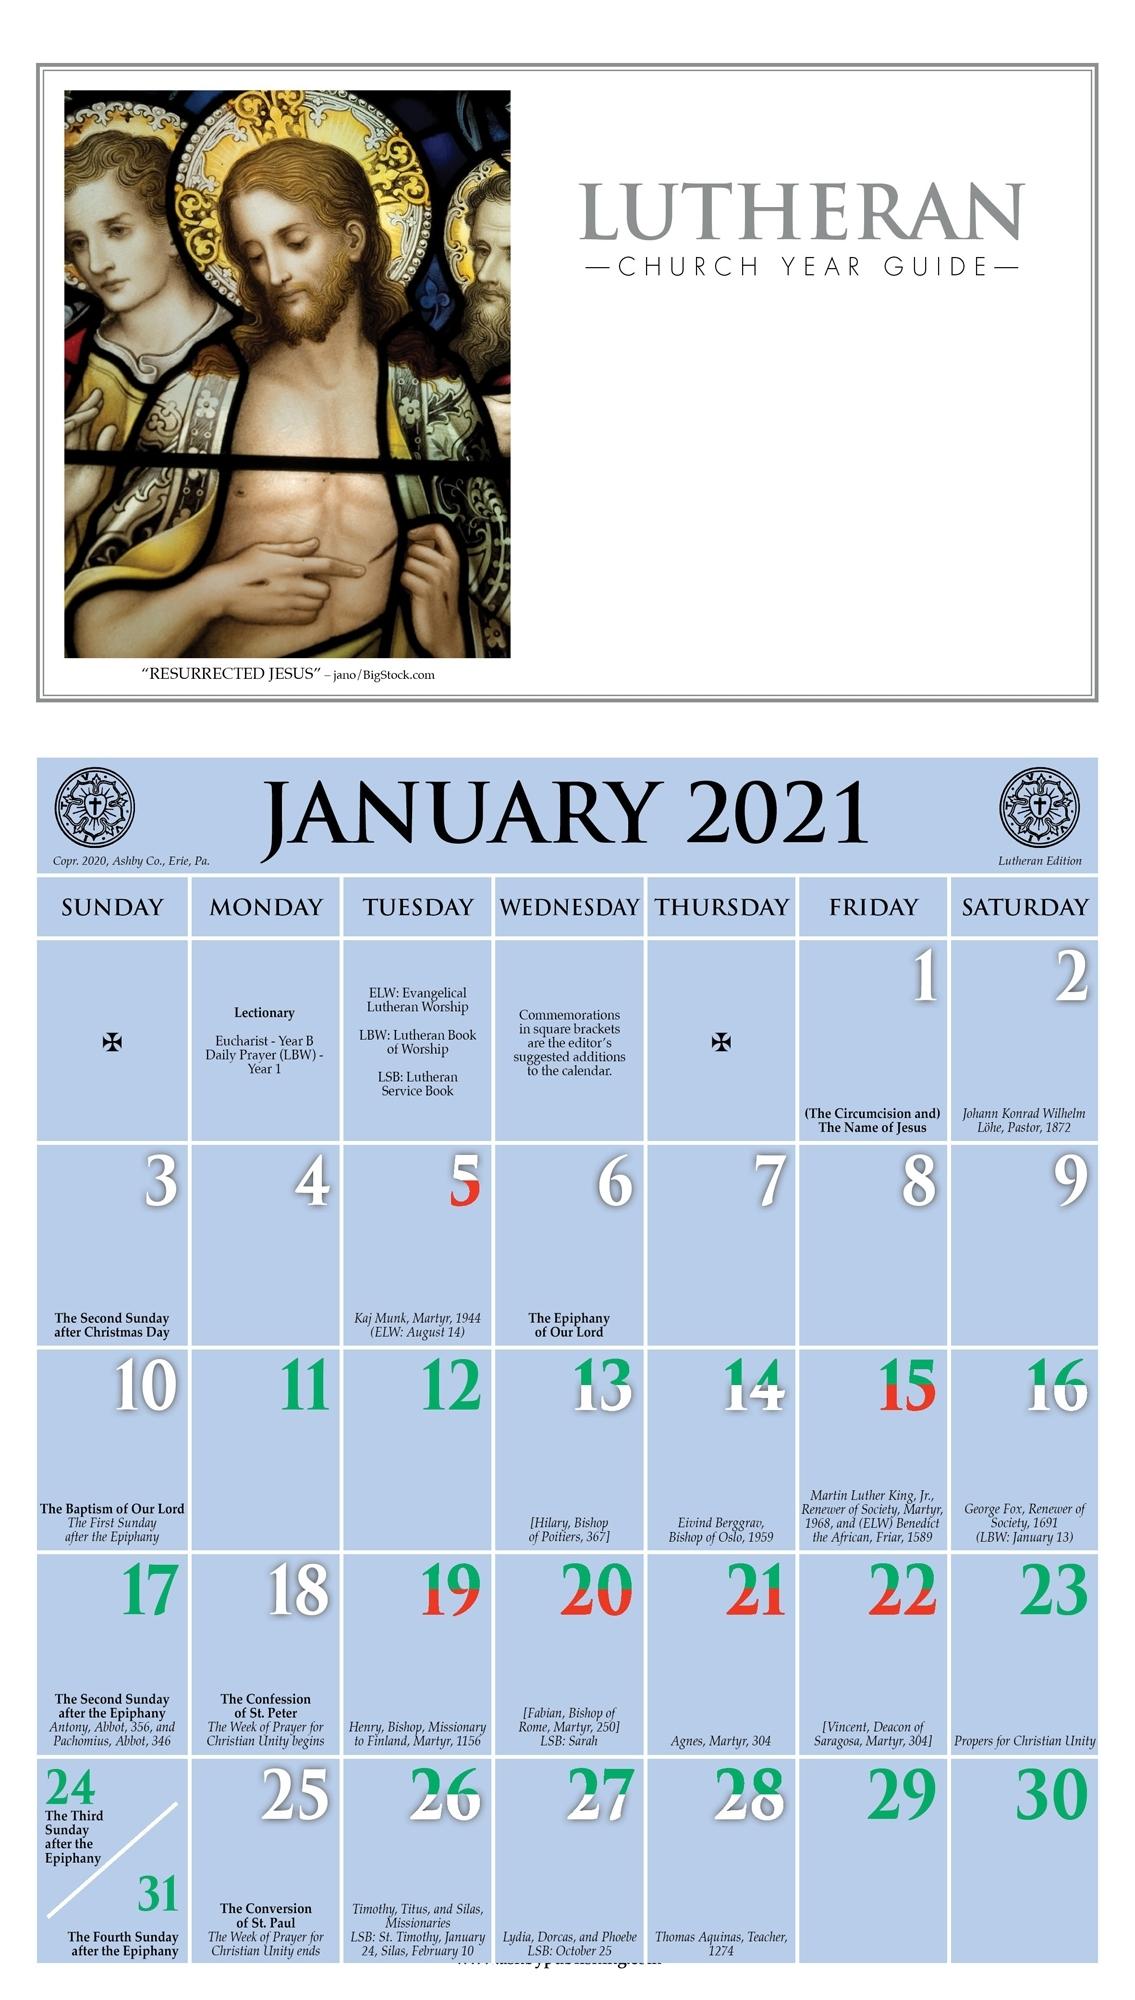 2021 Church Year Calendar in How To Make A Children Church Year Calendar